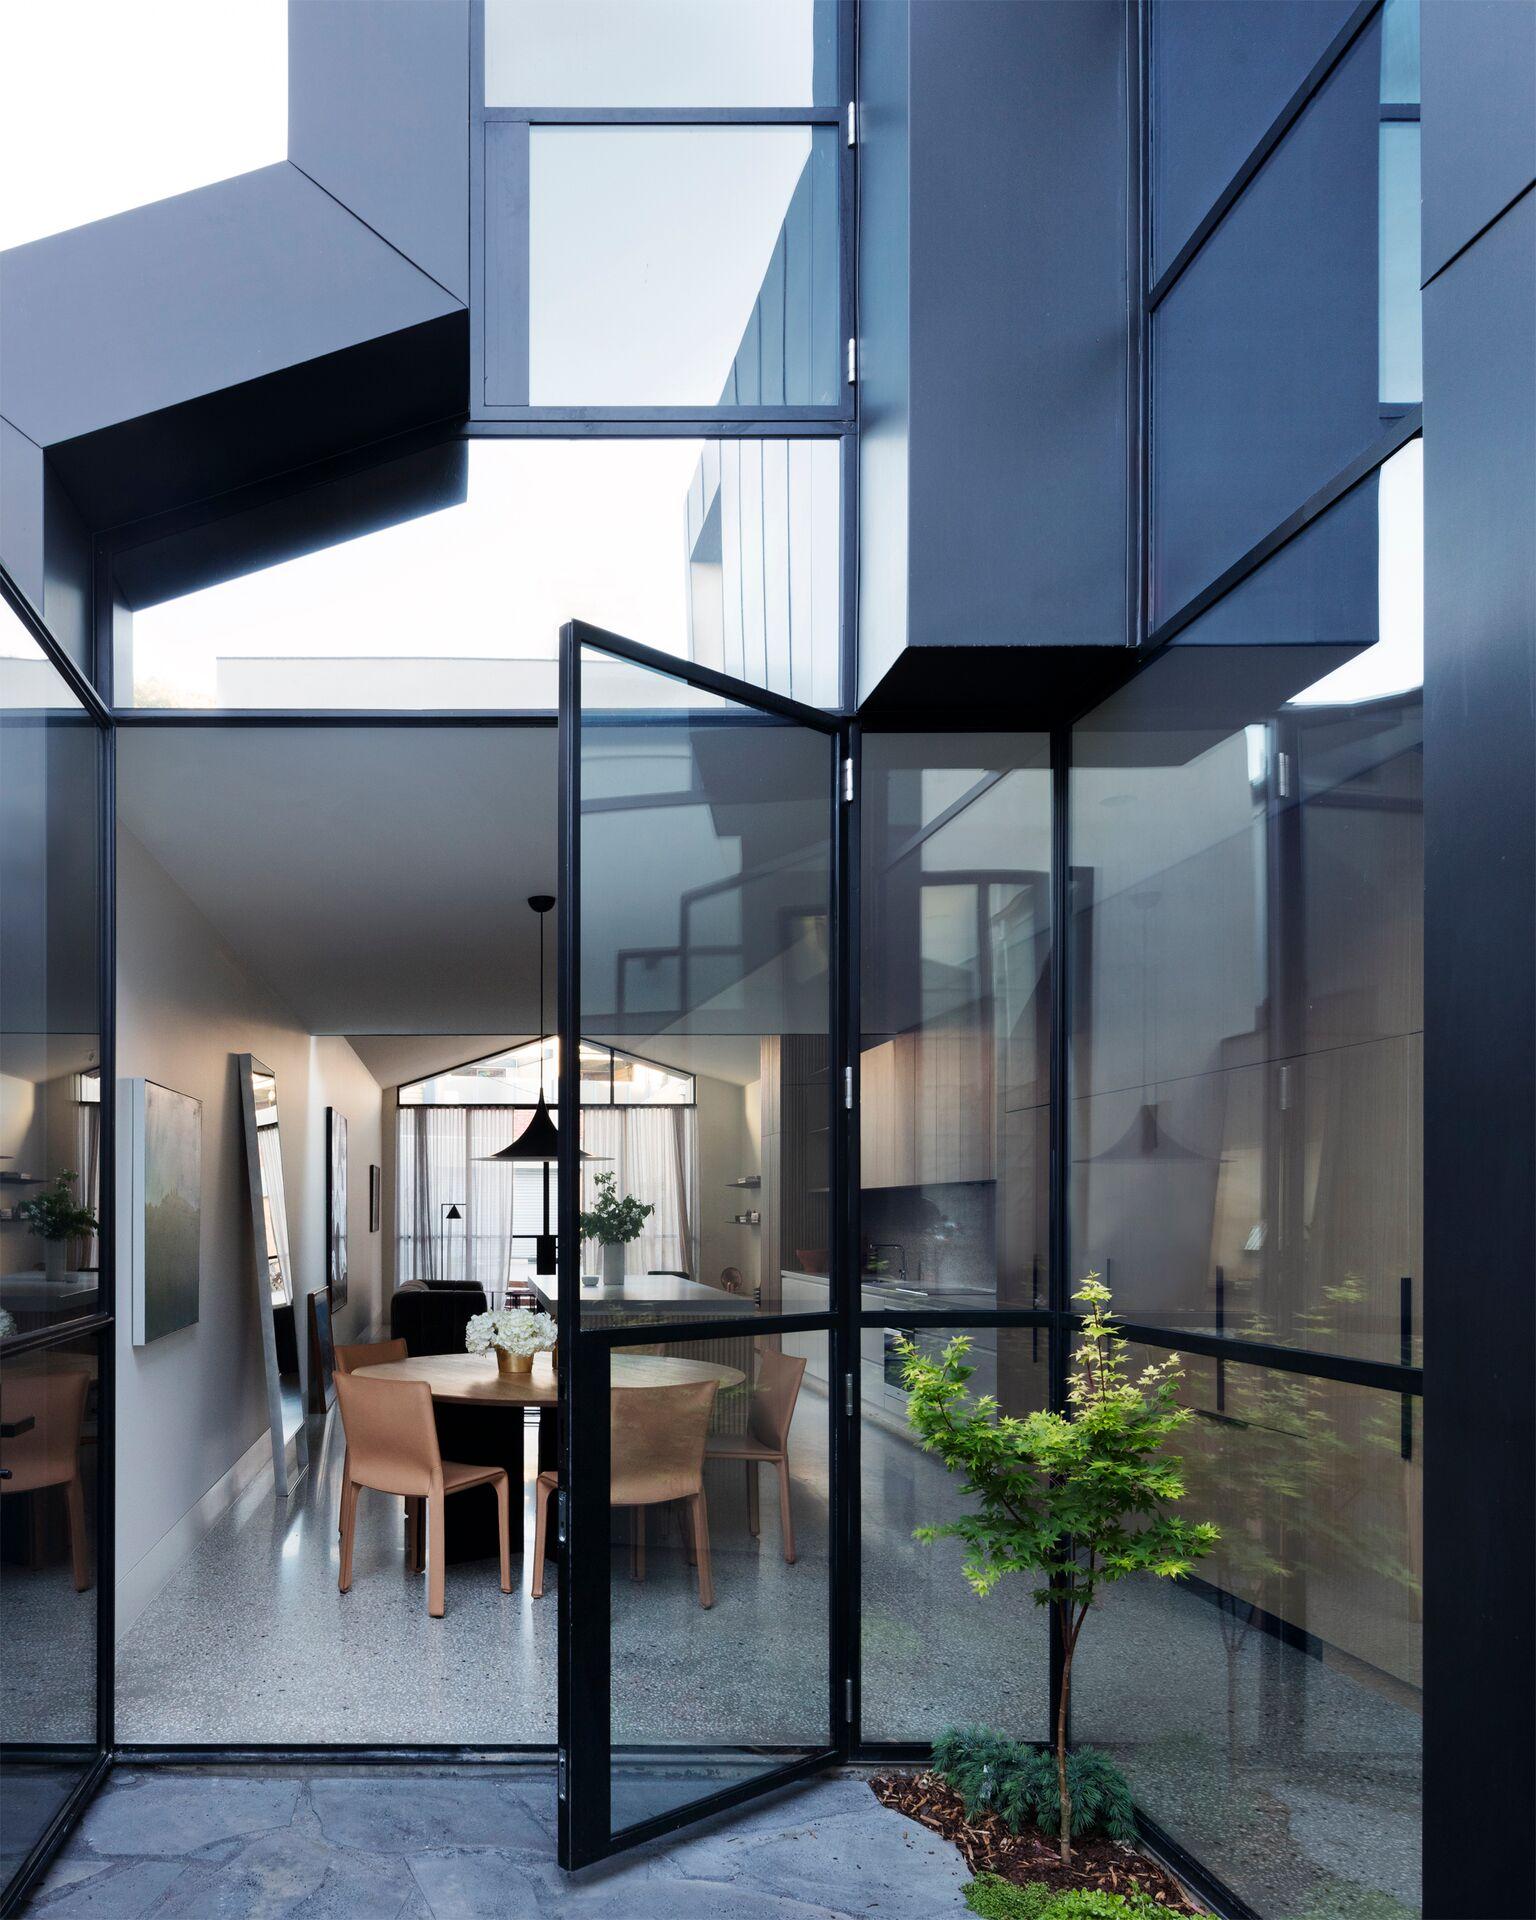 Fesselnd Port Melbourne House   Pandolfini Architect U0026 Duo Built   VIC, Australia    Rory Gardiner